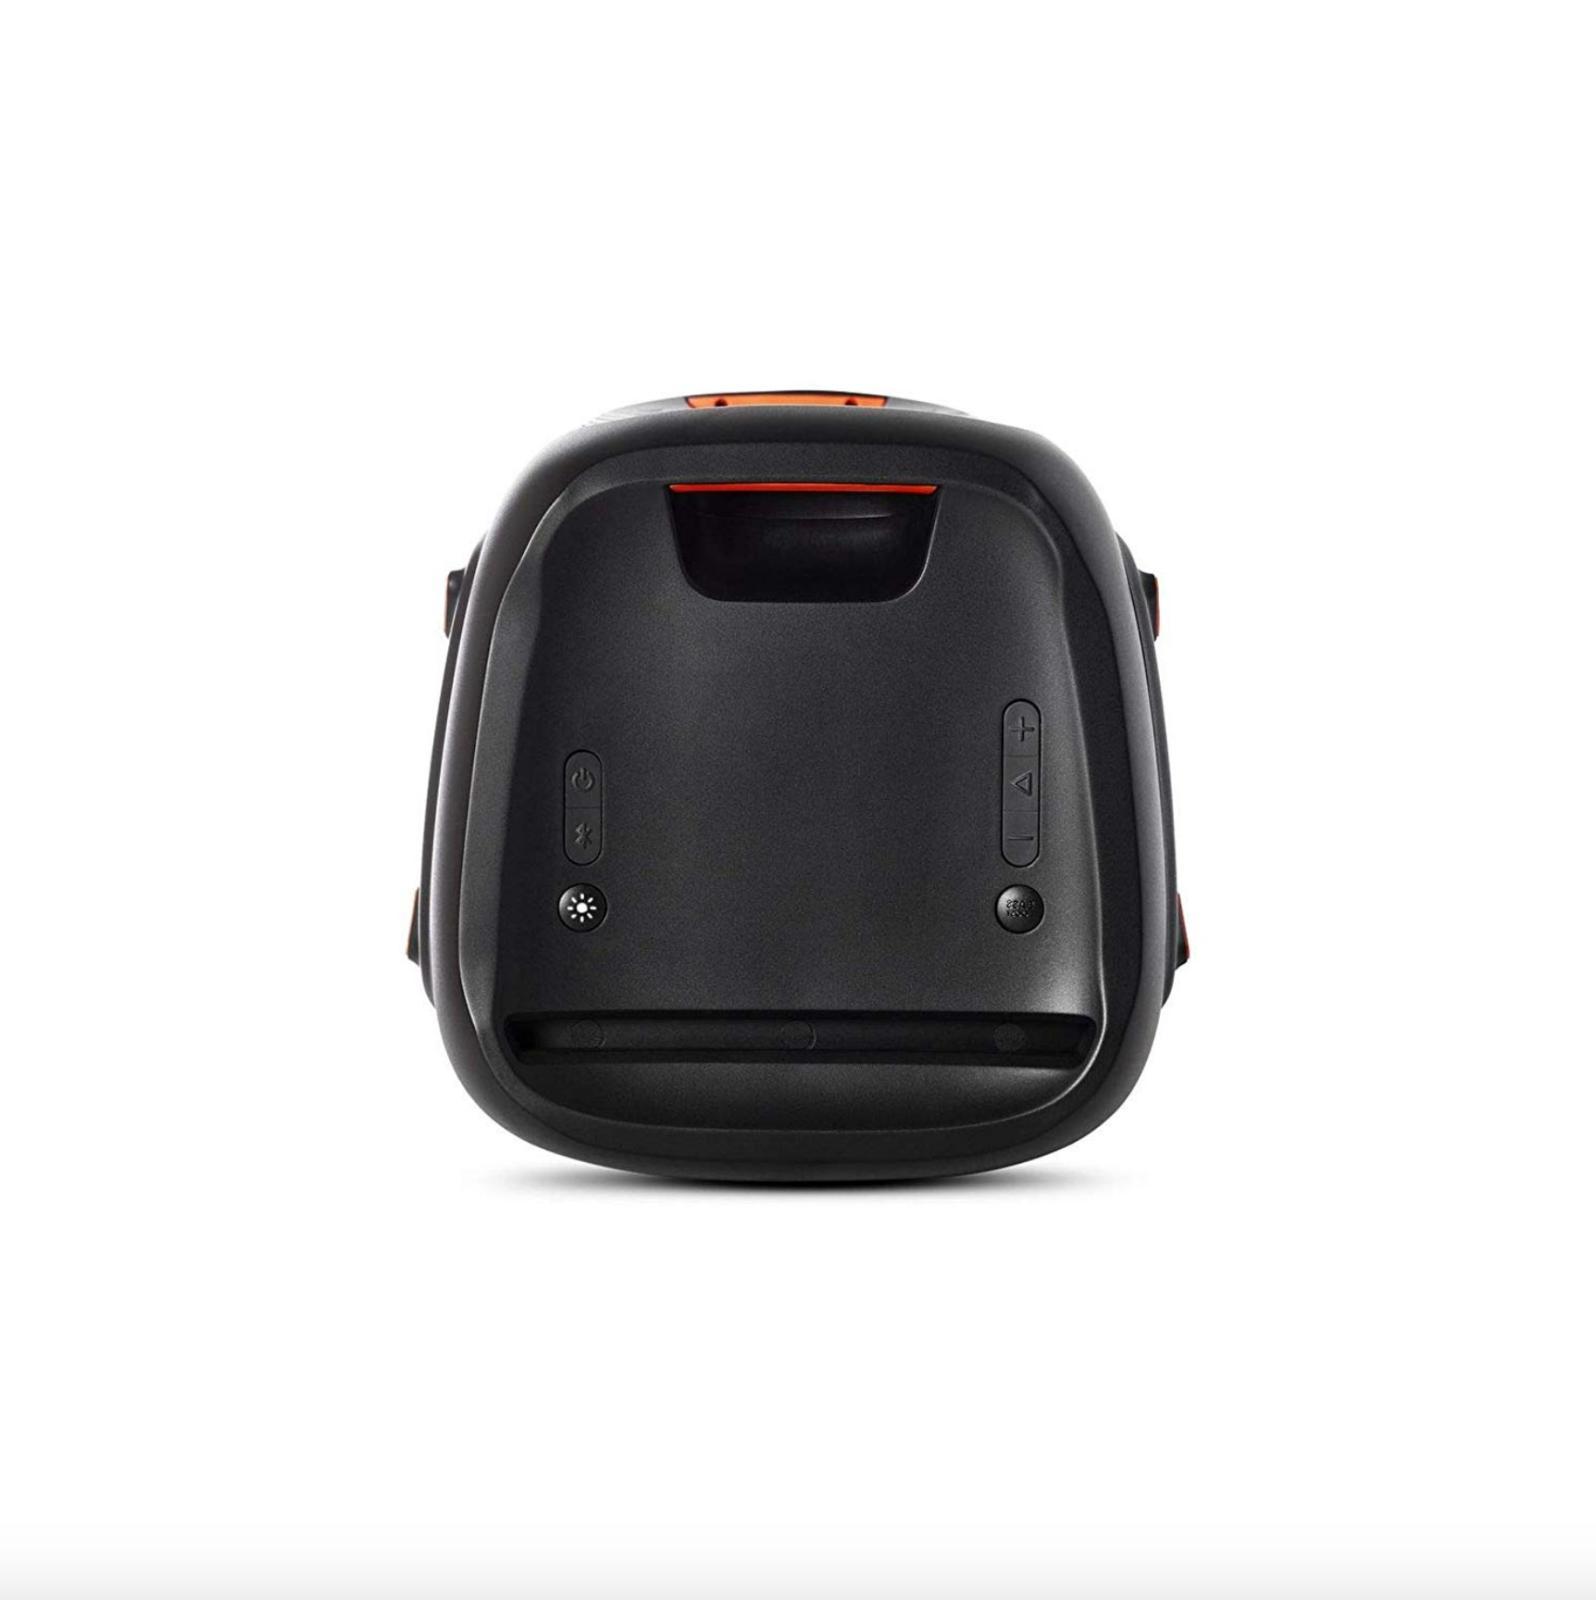 JBL Boombox Bluetooth Speaker Favors hours